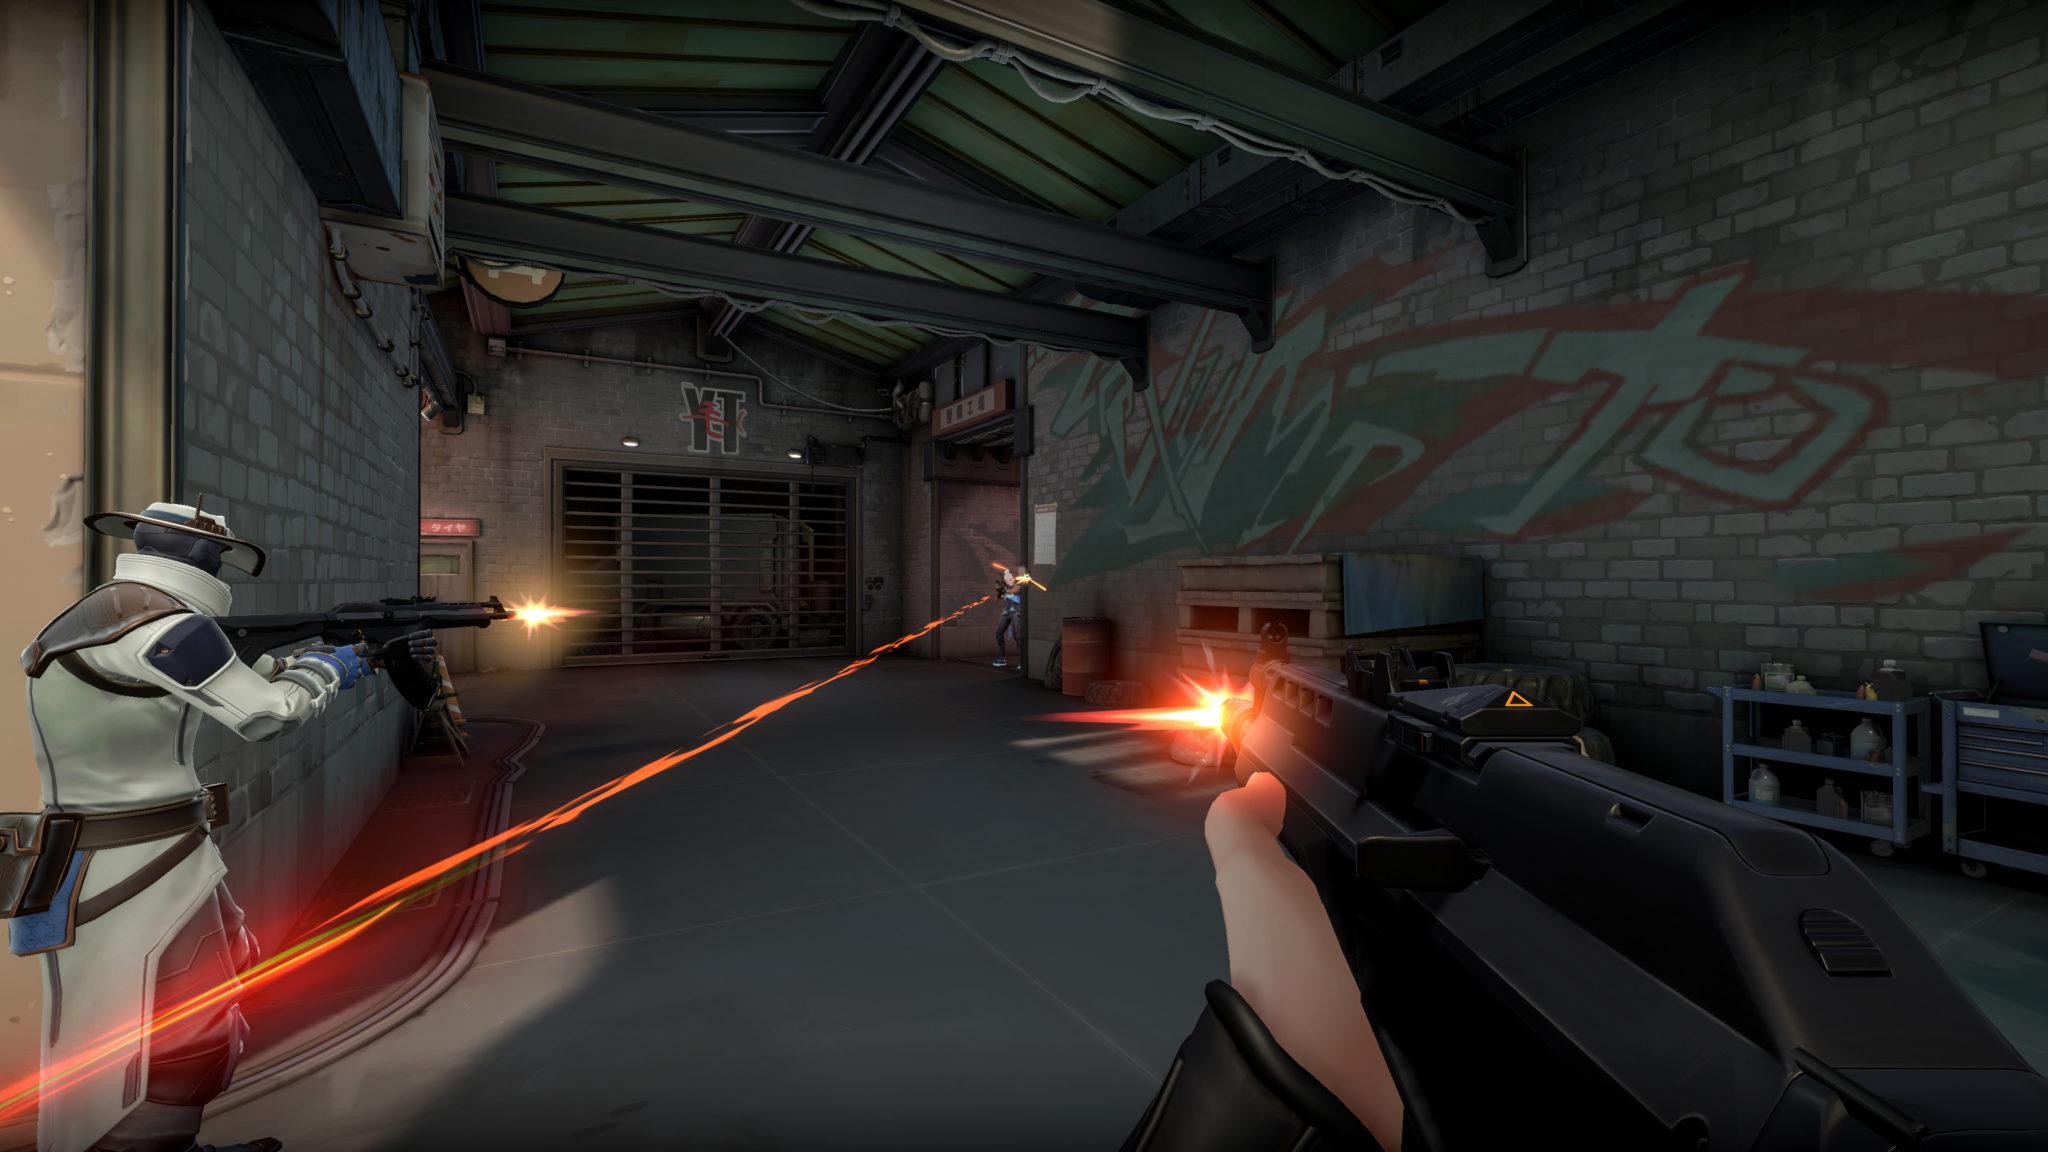 Player shooting Jett in Valorant.